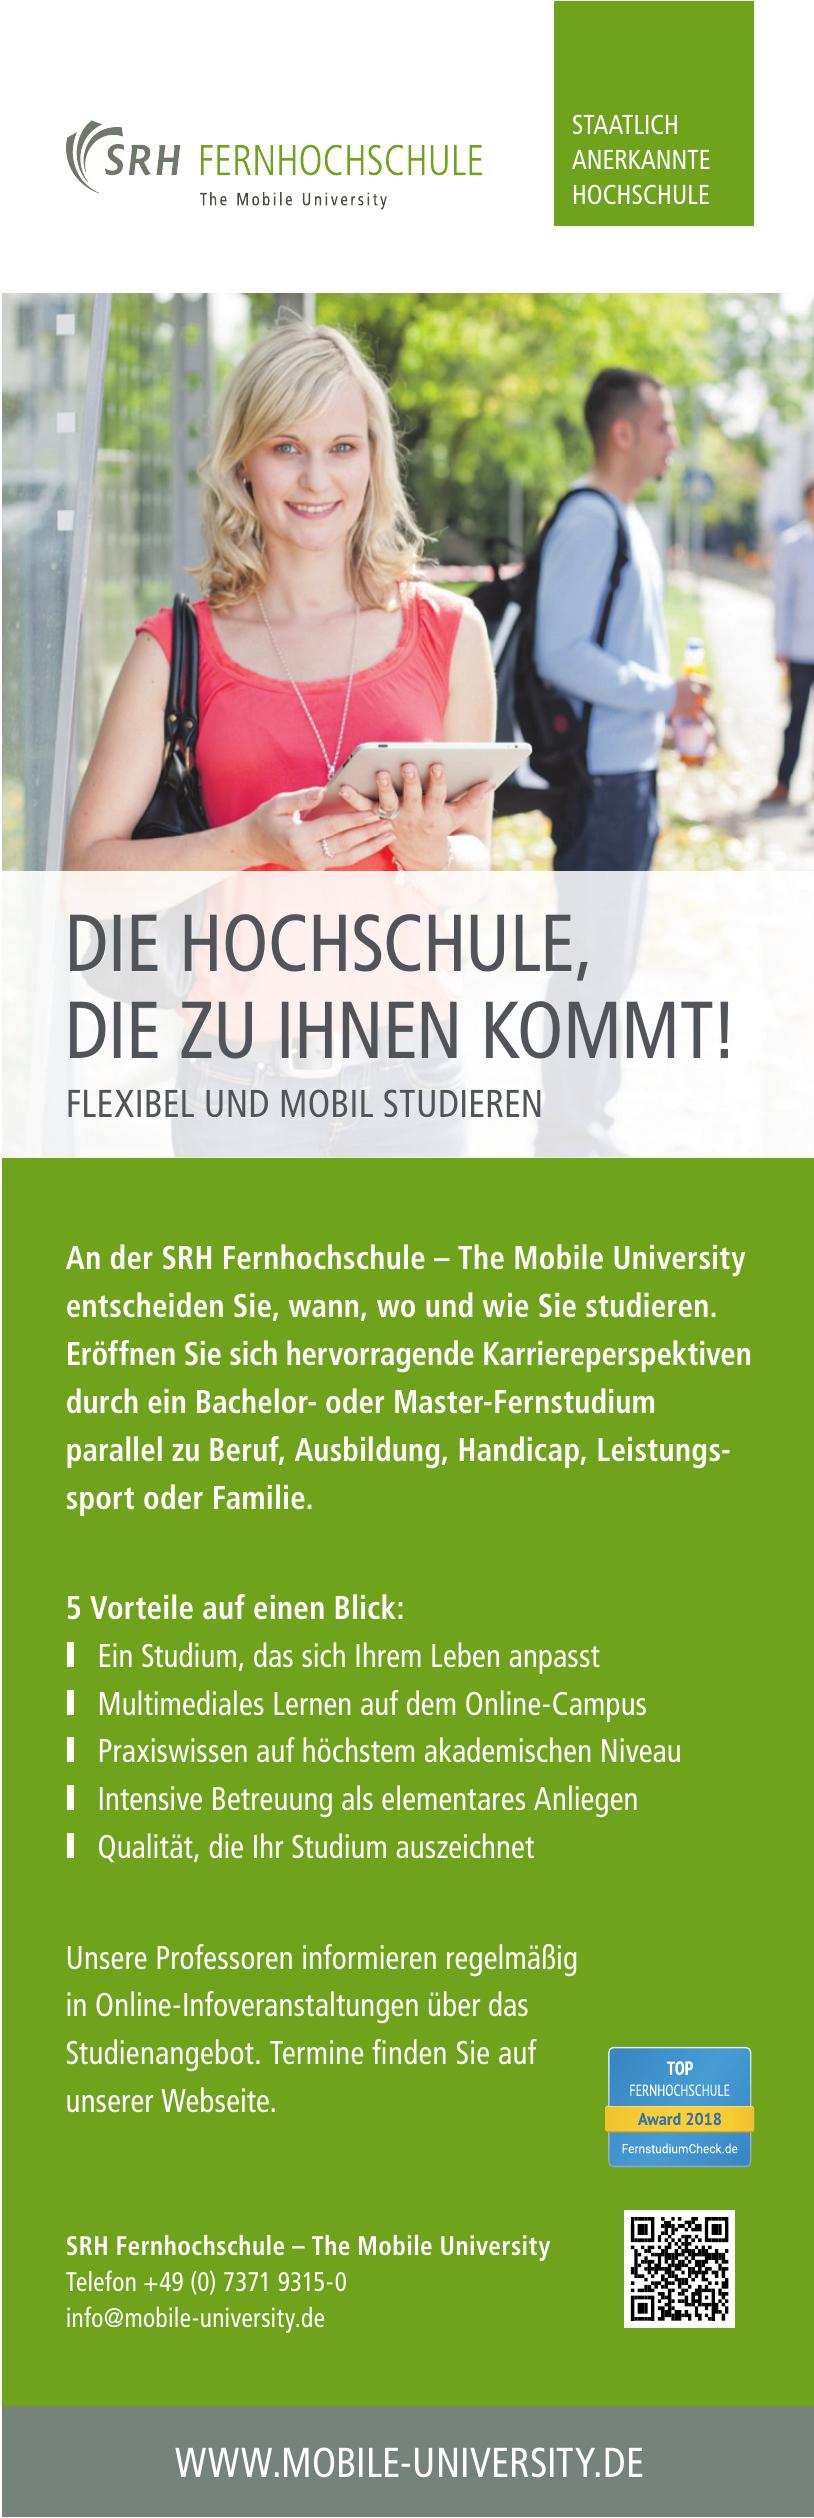 SRH Fernhochschule – The Mobile University